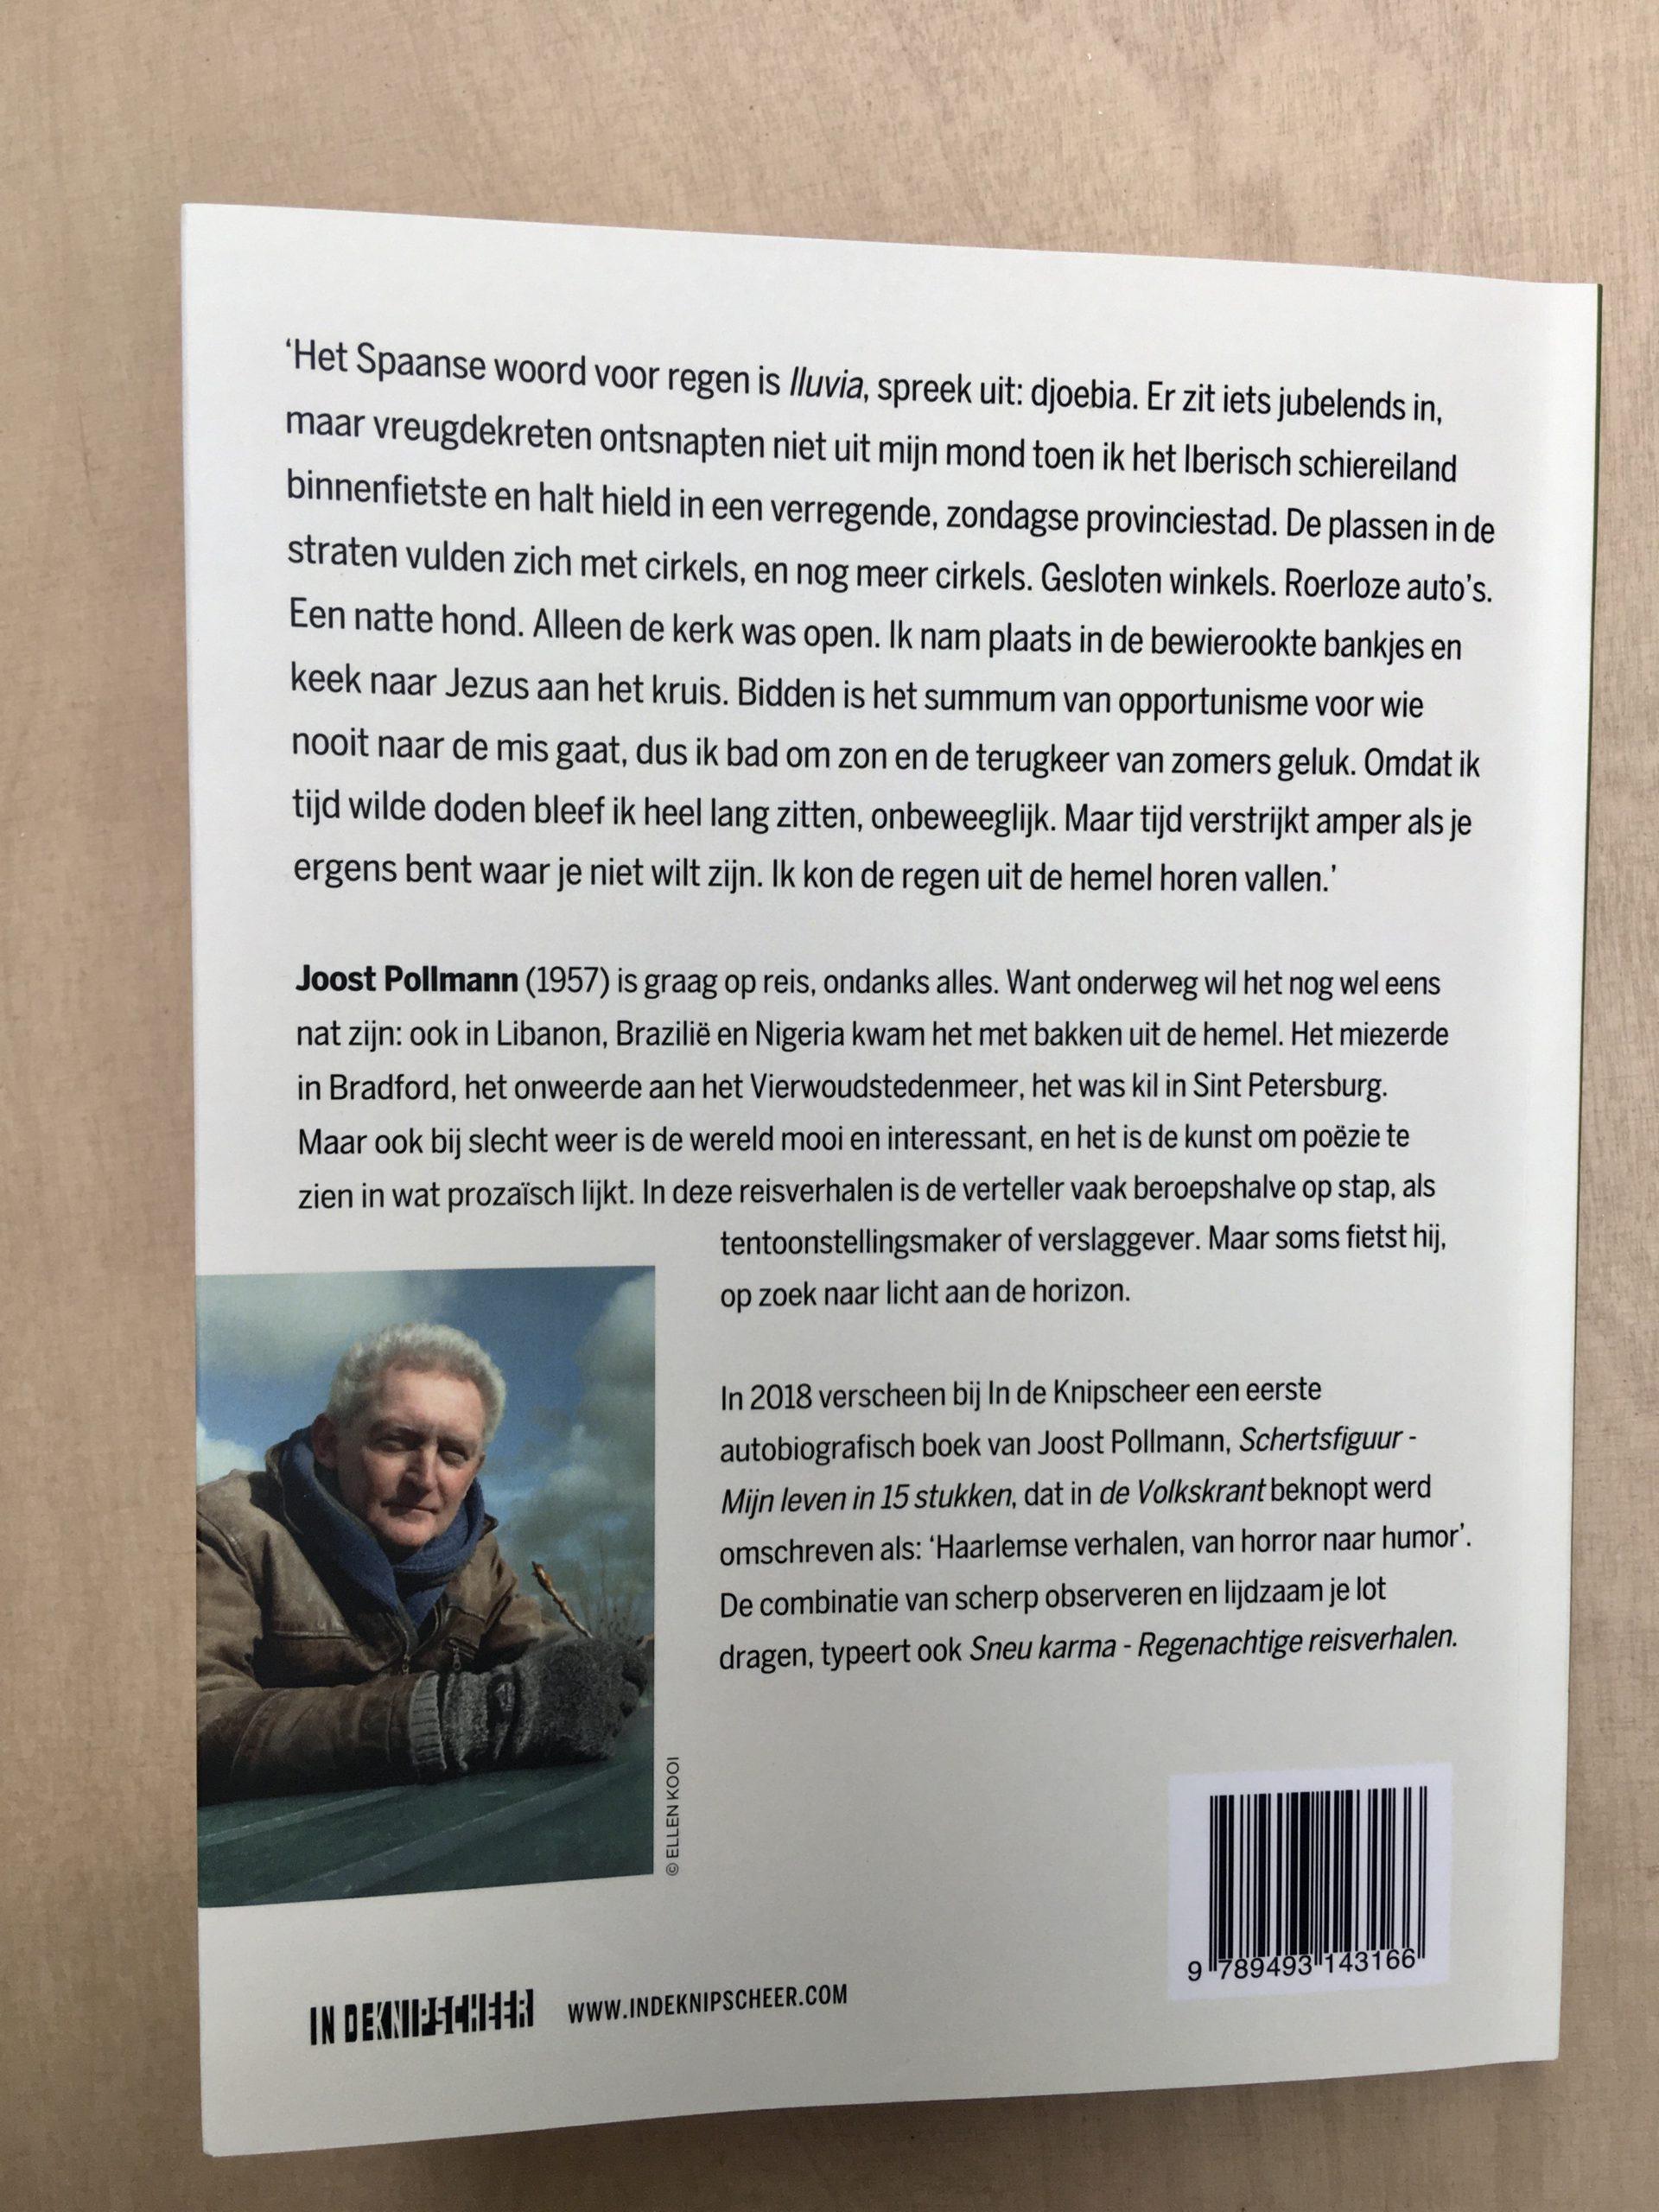 Sneu karma travel stories by Joost Pollmann